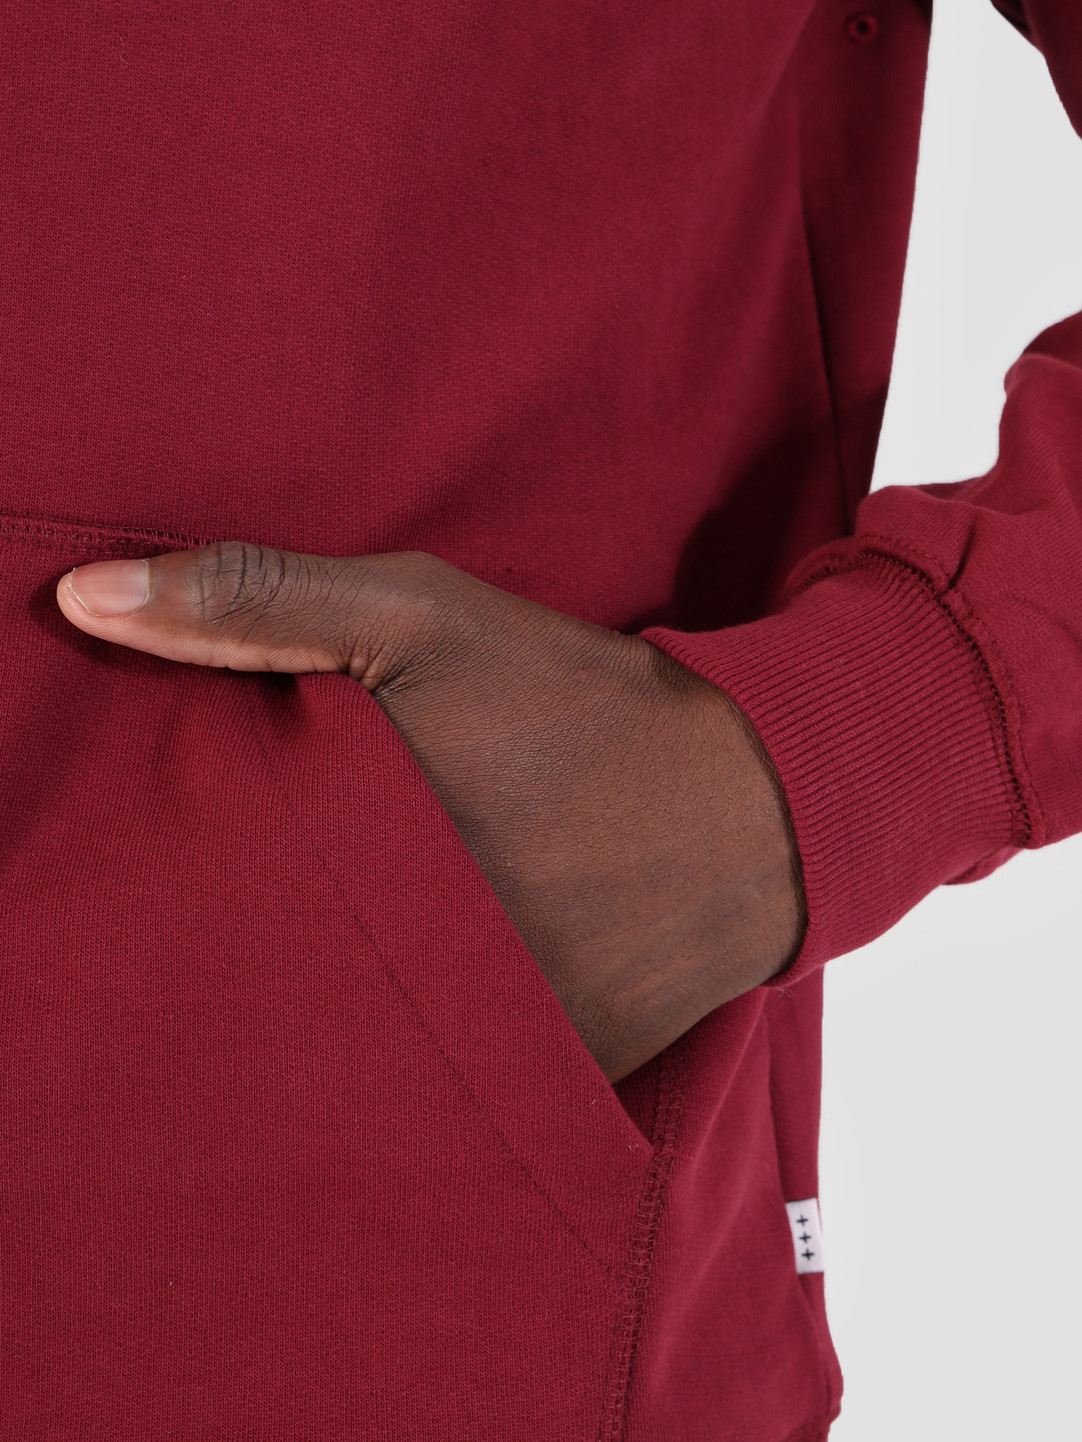 Quality Blanks Quality Blanks QB93 Classic Hoodie Burgundy Red